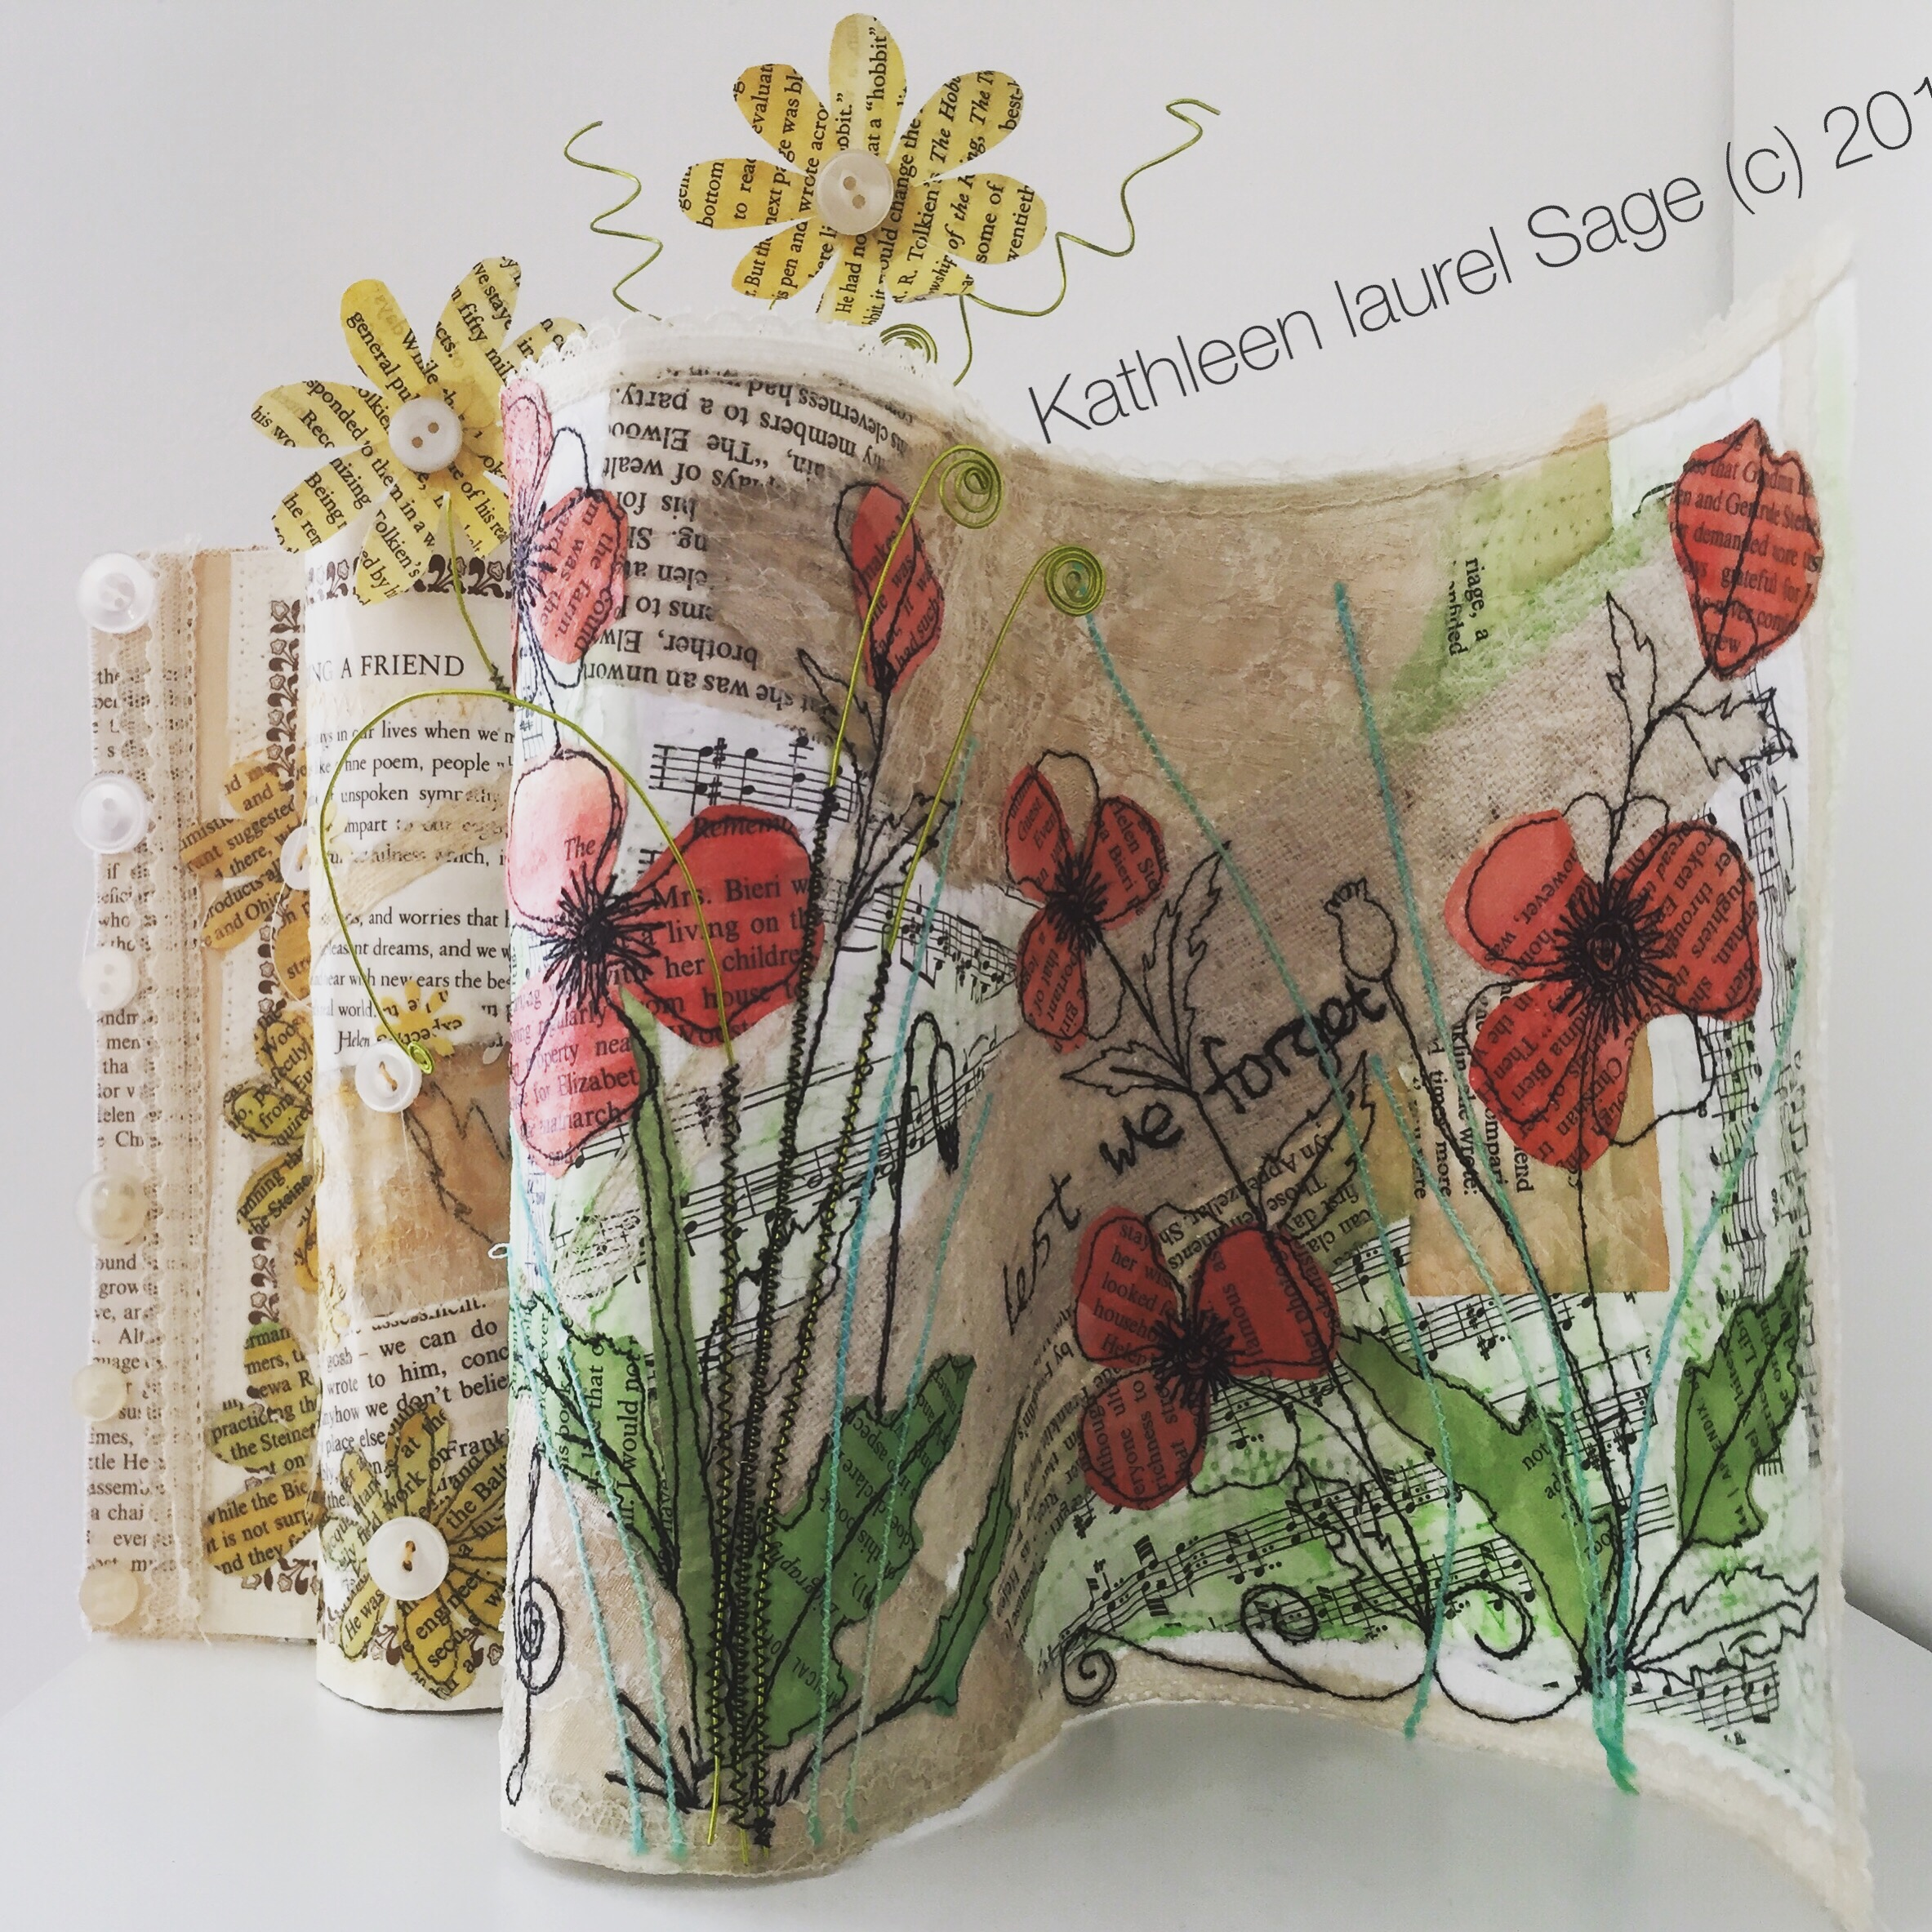 Embroidered Scrolls with Kathleen Laurel Sage